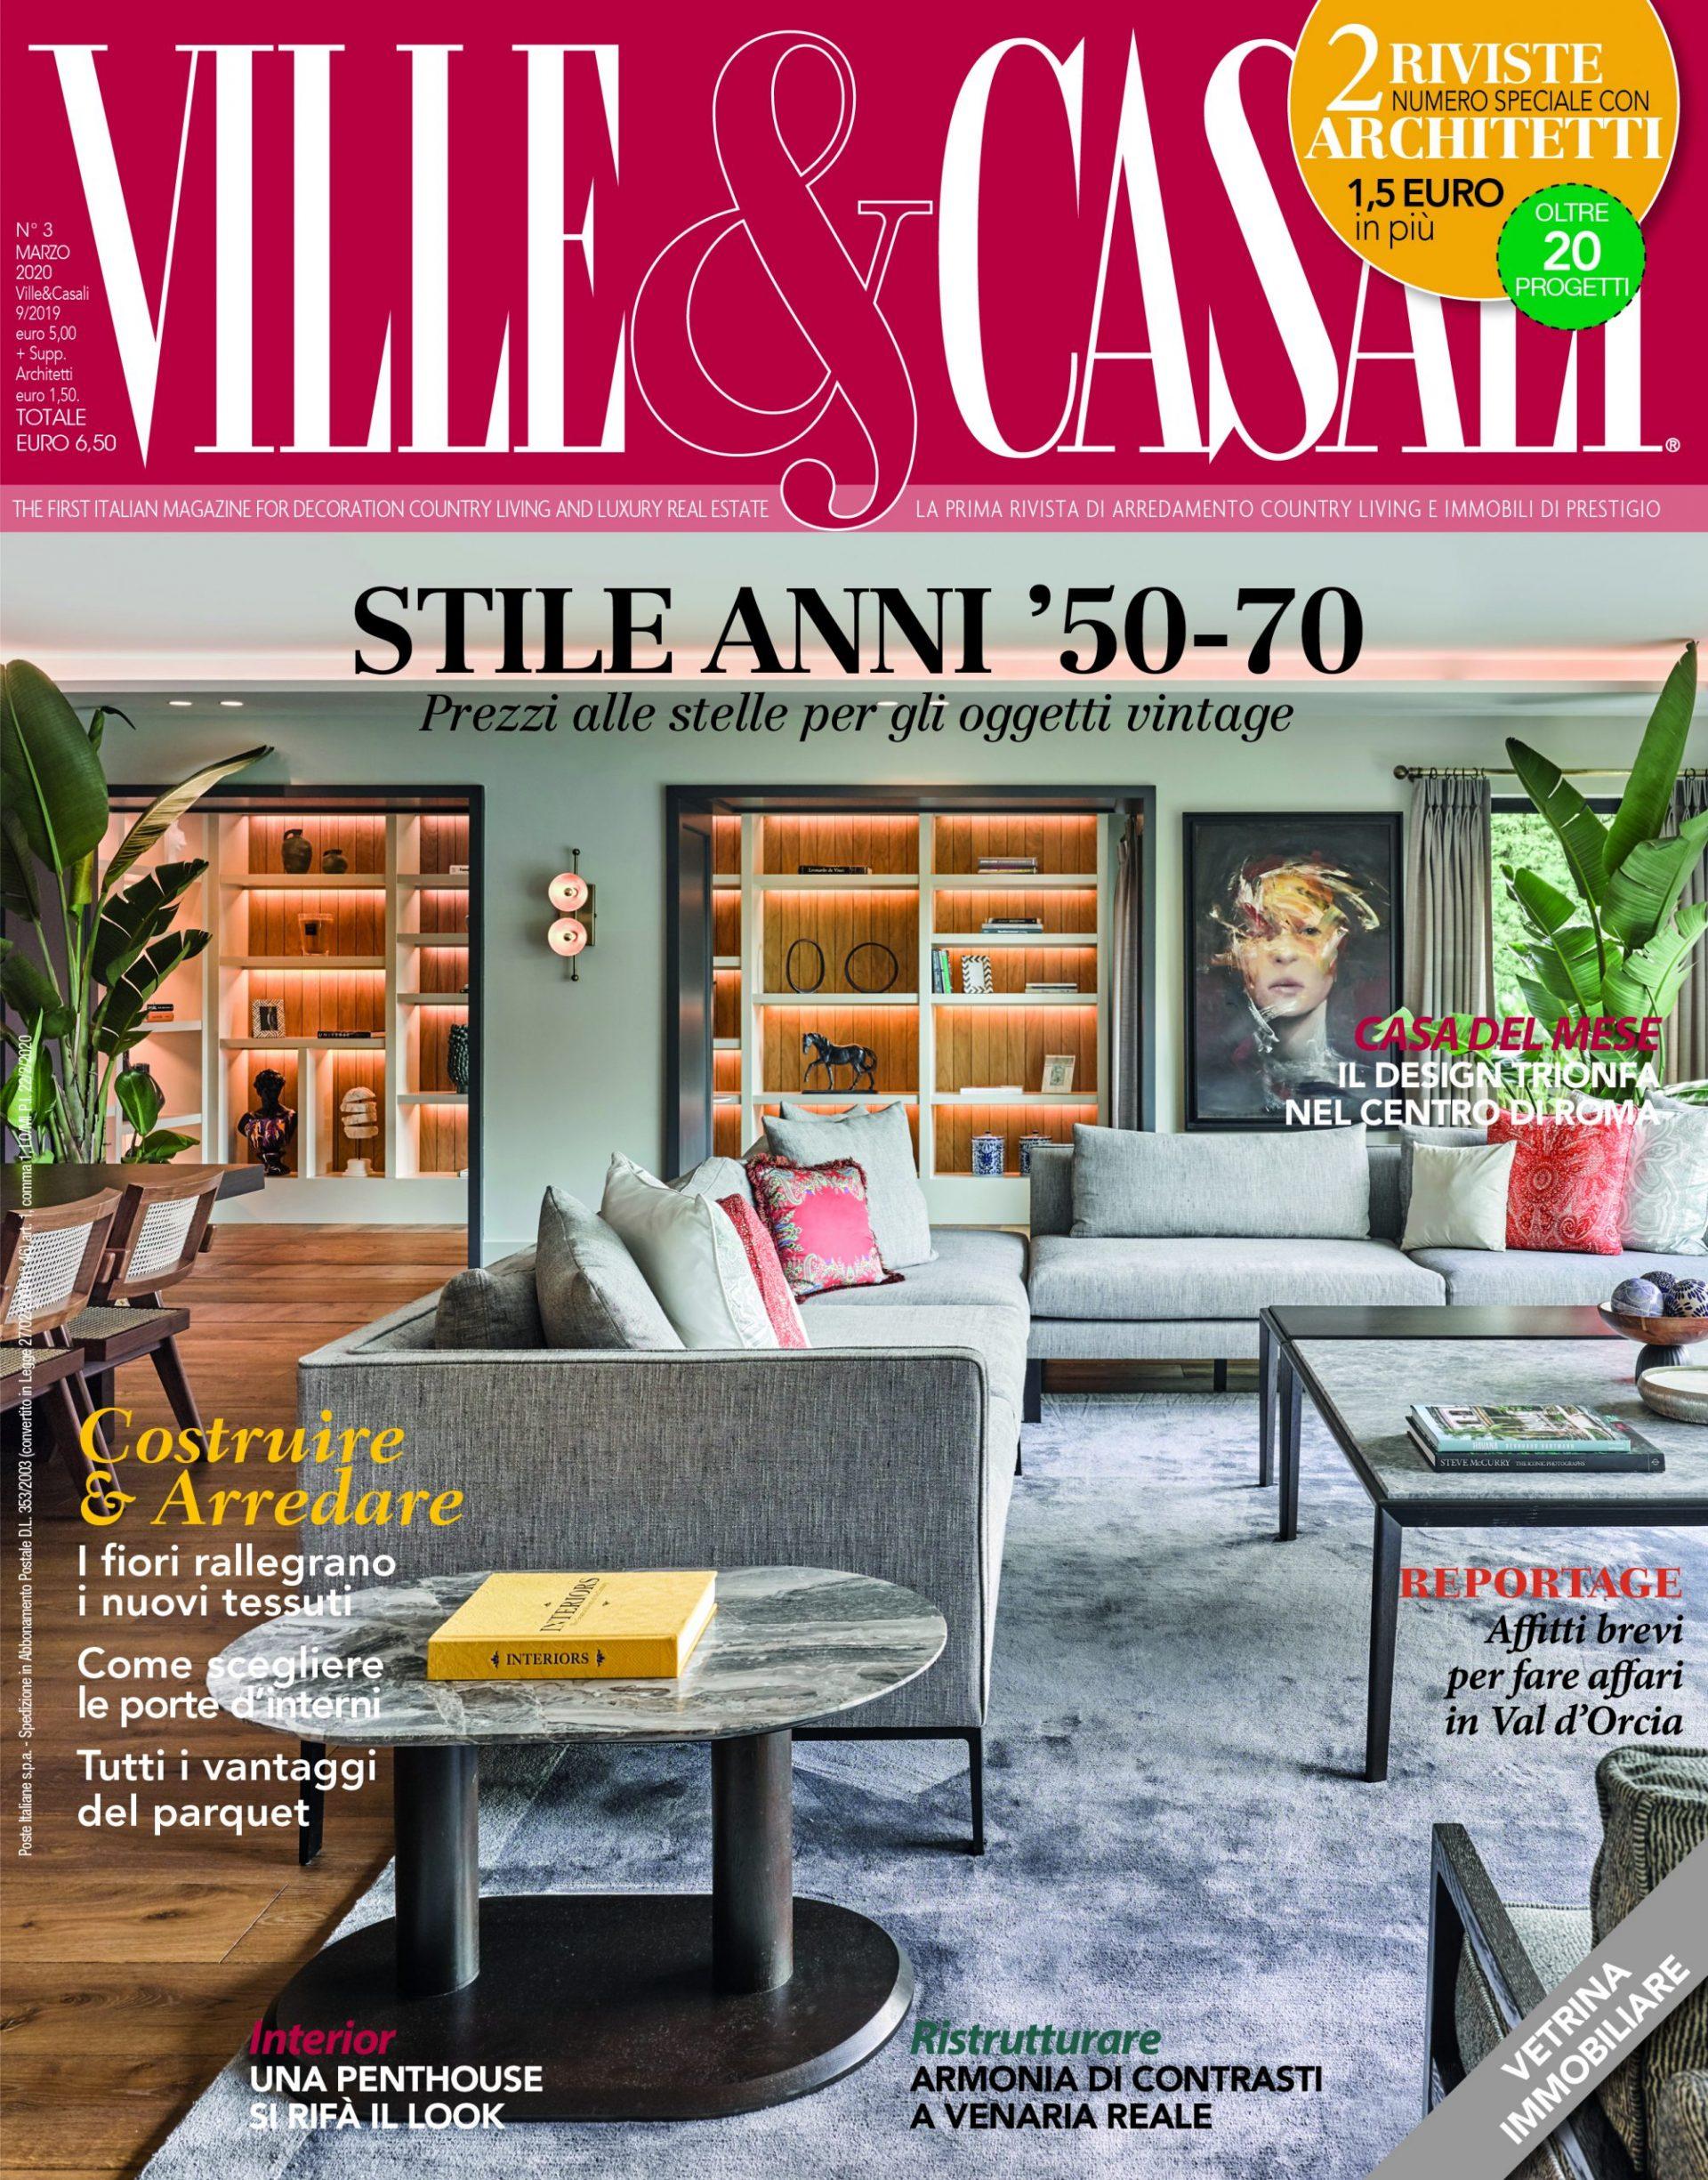 Ville&Casali 03/20 | Casa del mese